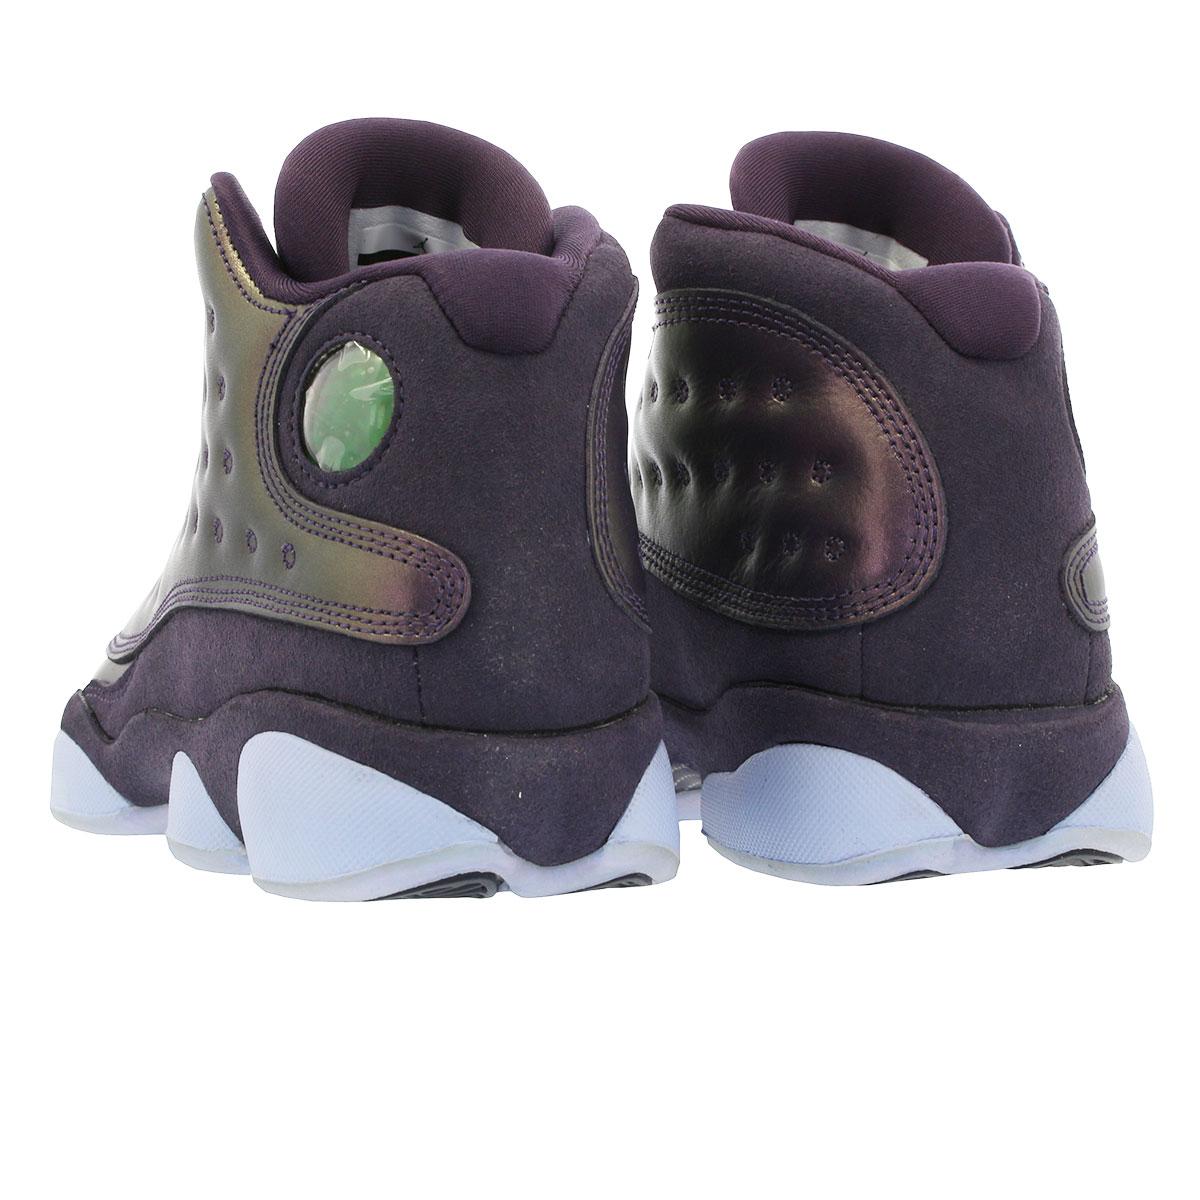 996a86d8 ... NIKE AIR JORDAN 13 RETRO Nike Air Jordan 13 nostalgic GG DARK RAISIN/HYDROGEN  BLUE ...